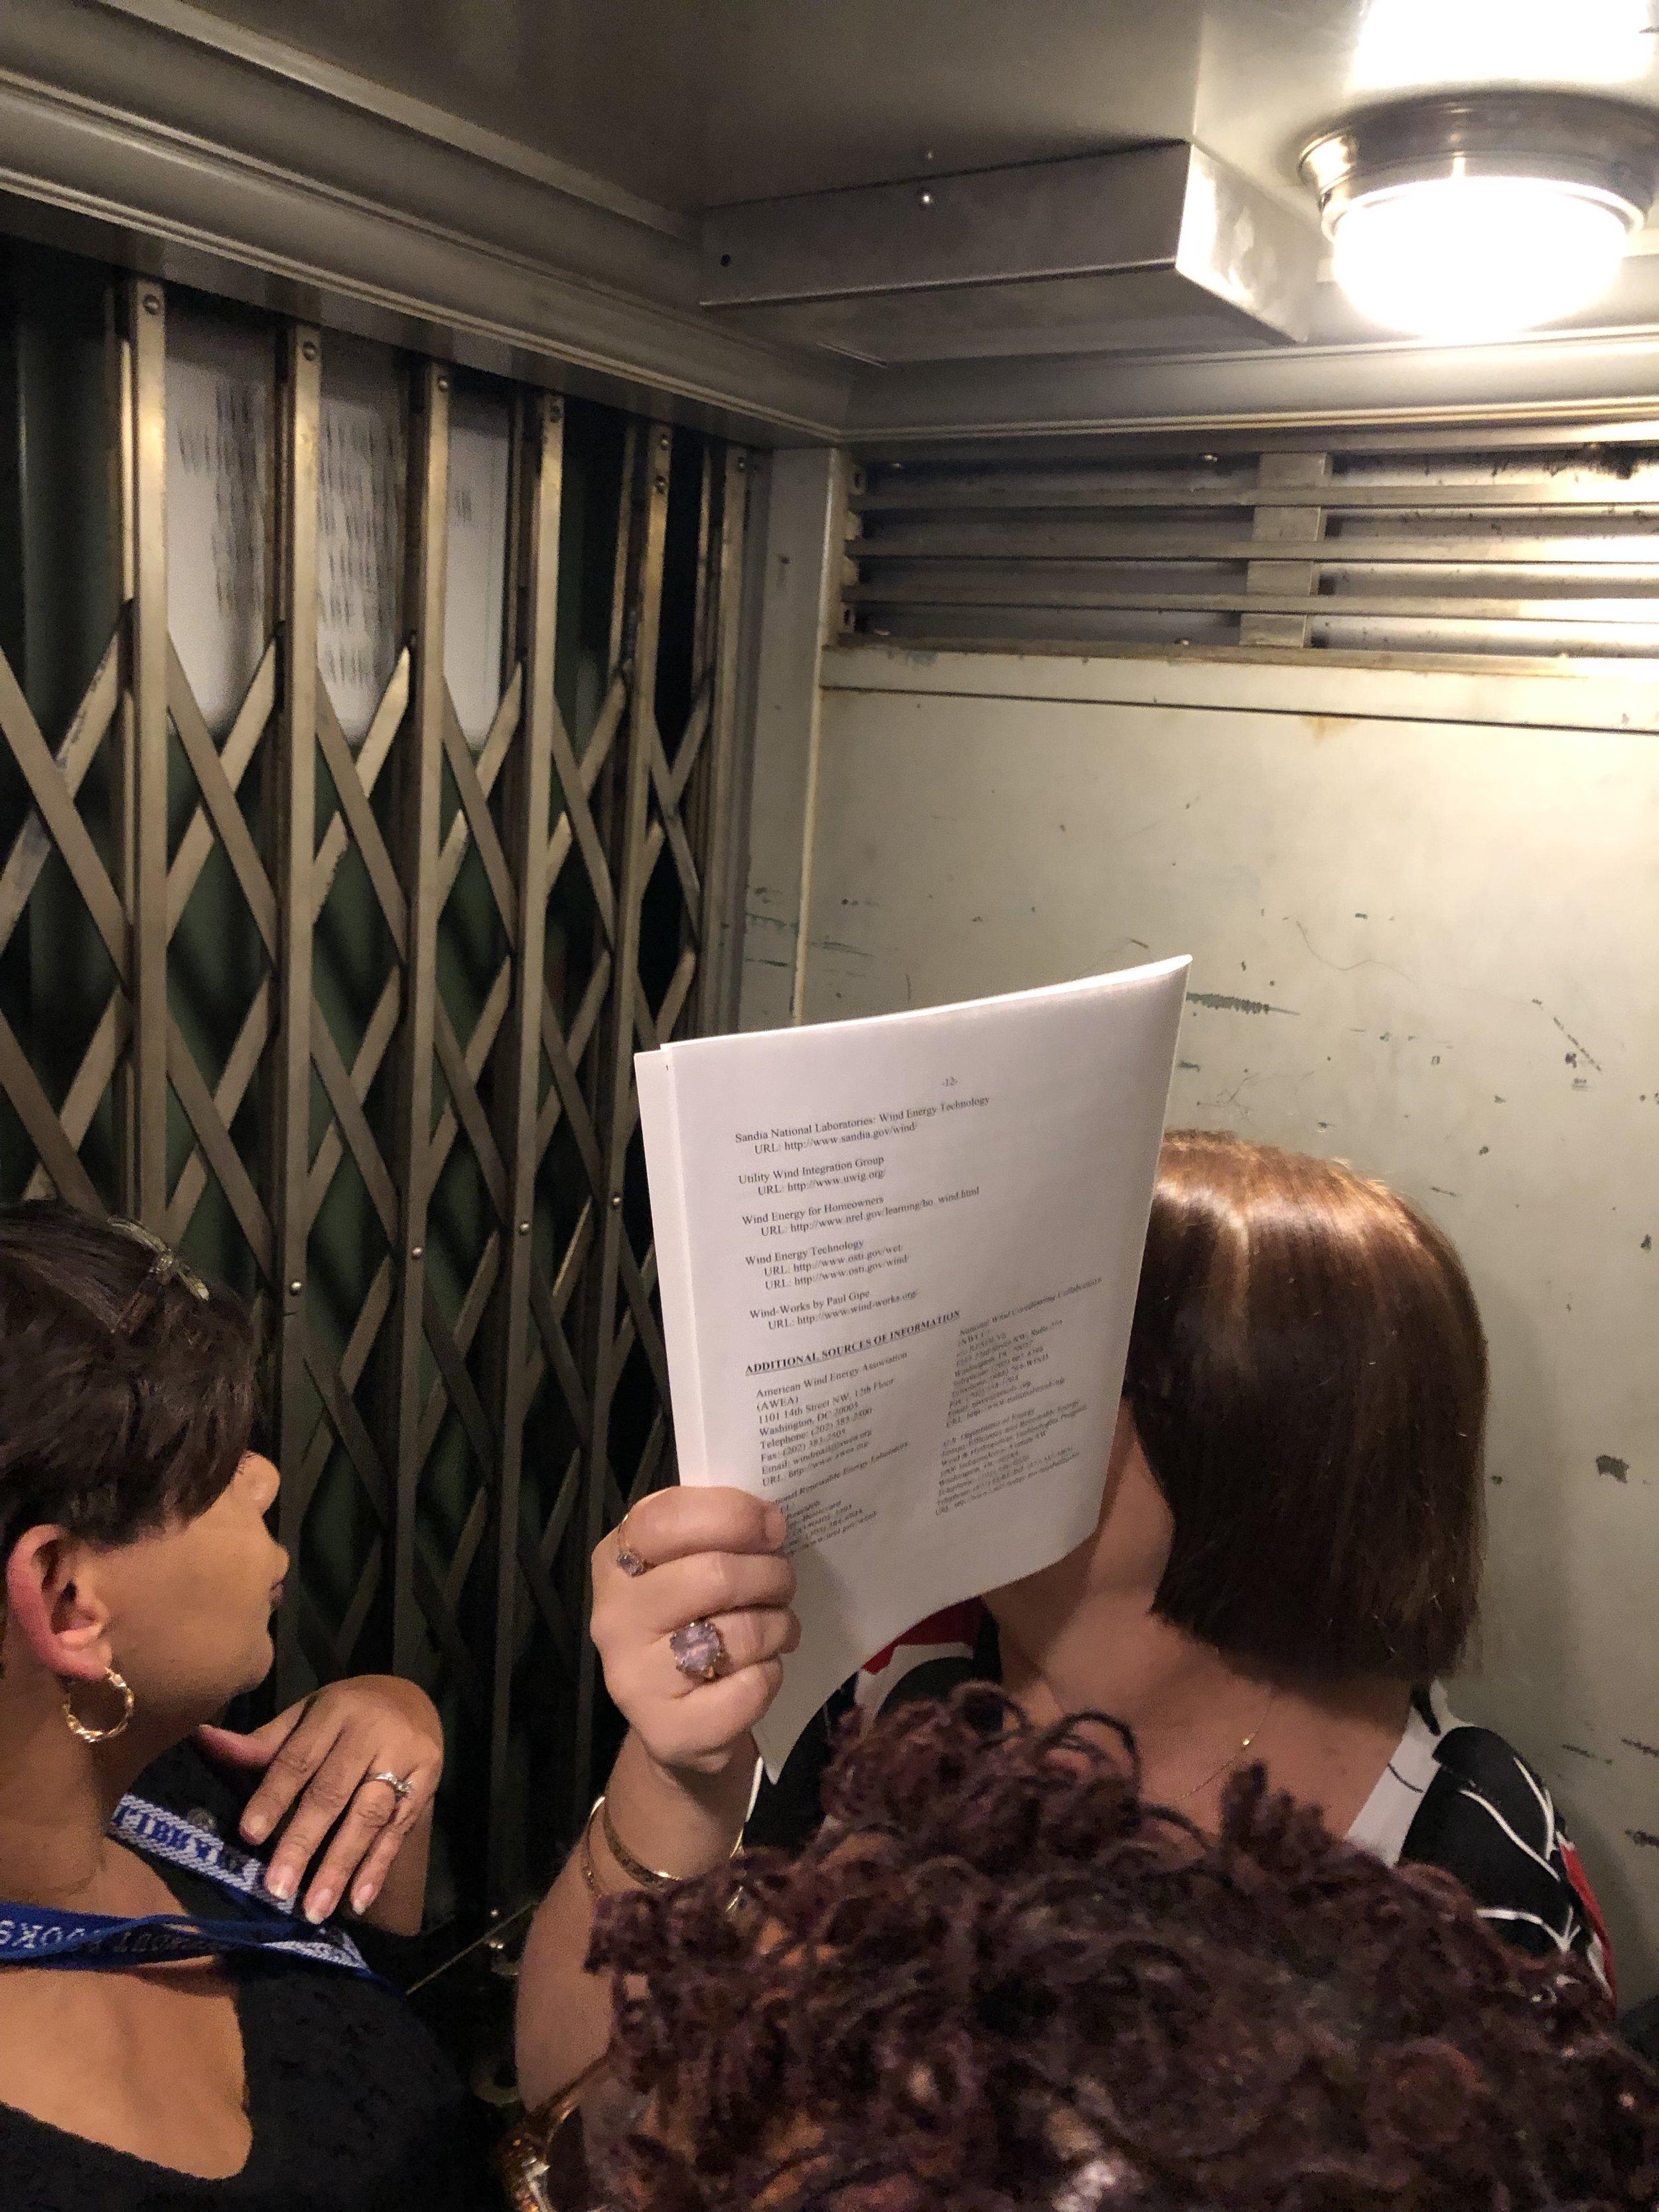 The Claustrophobic Elevator